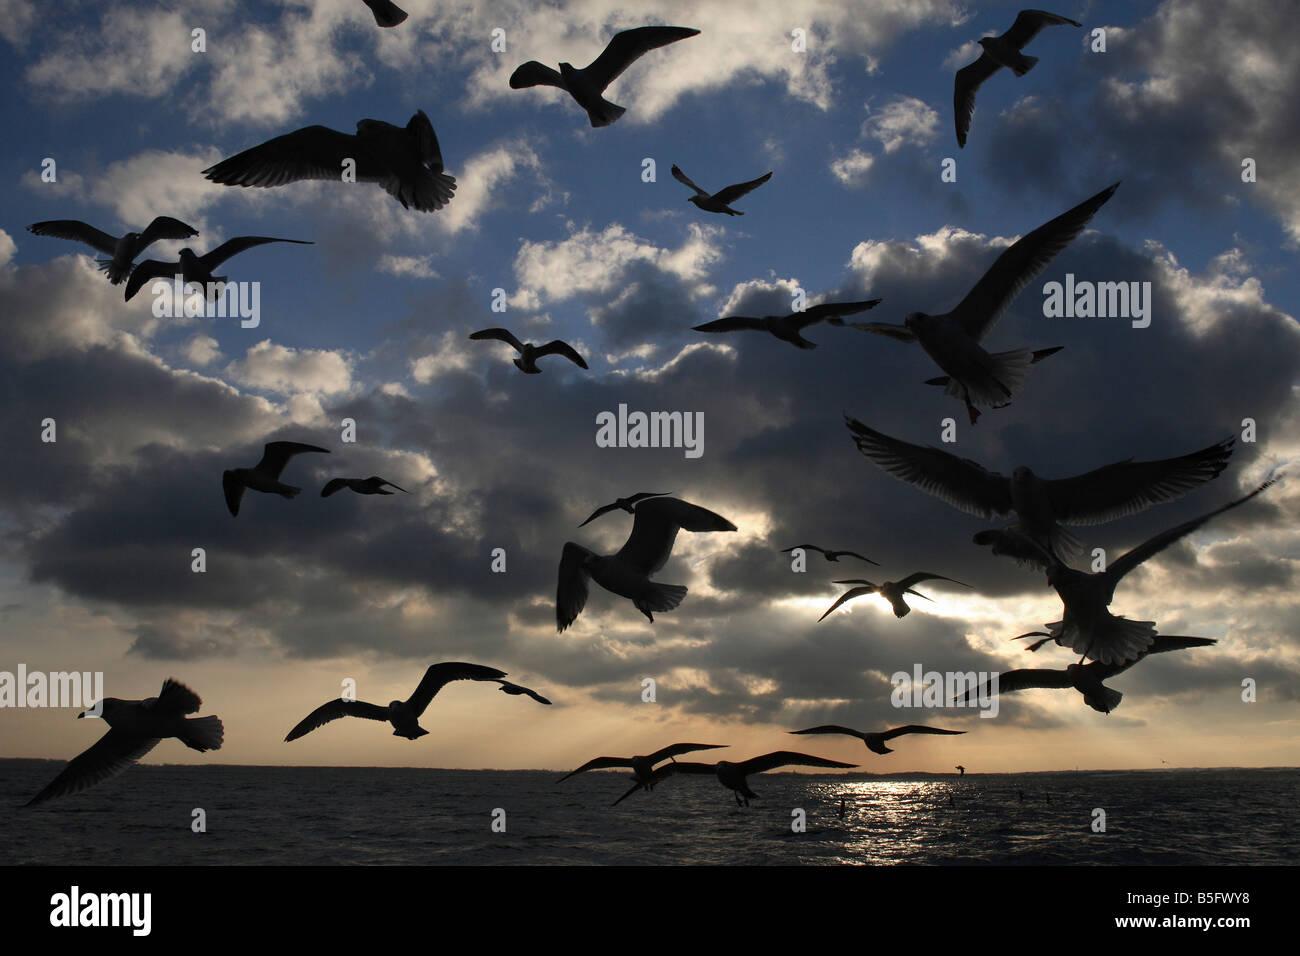 Flying eagulls against sunset at sea - Stock Image